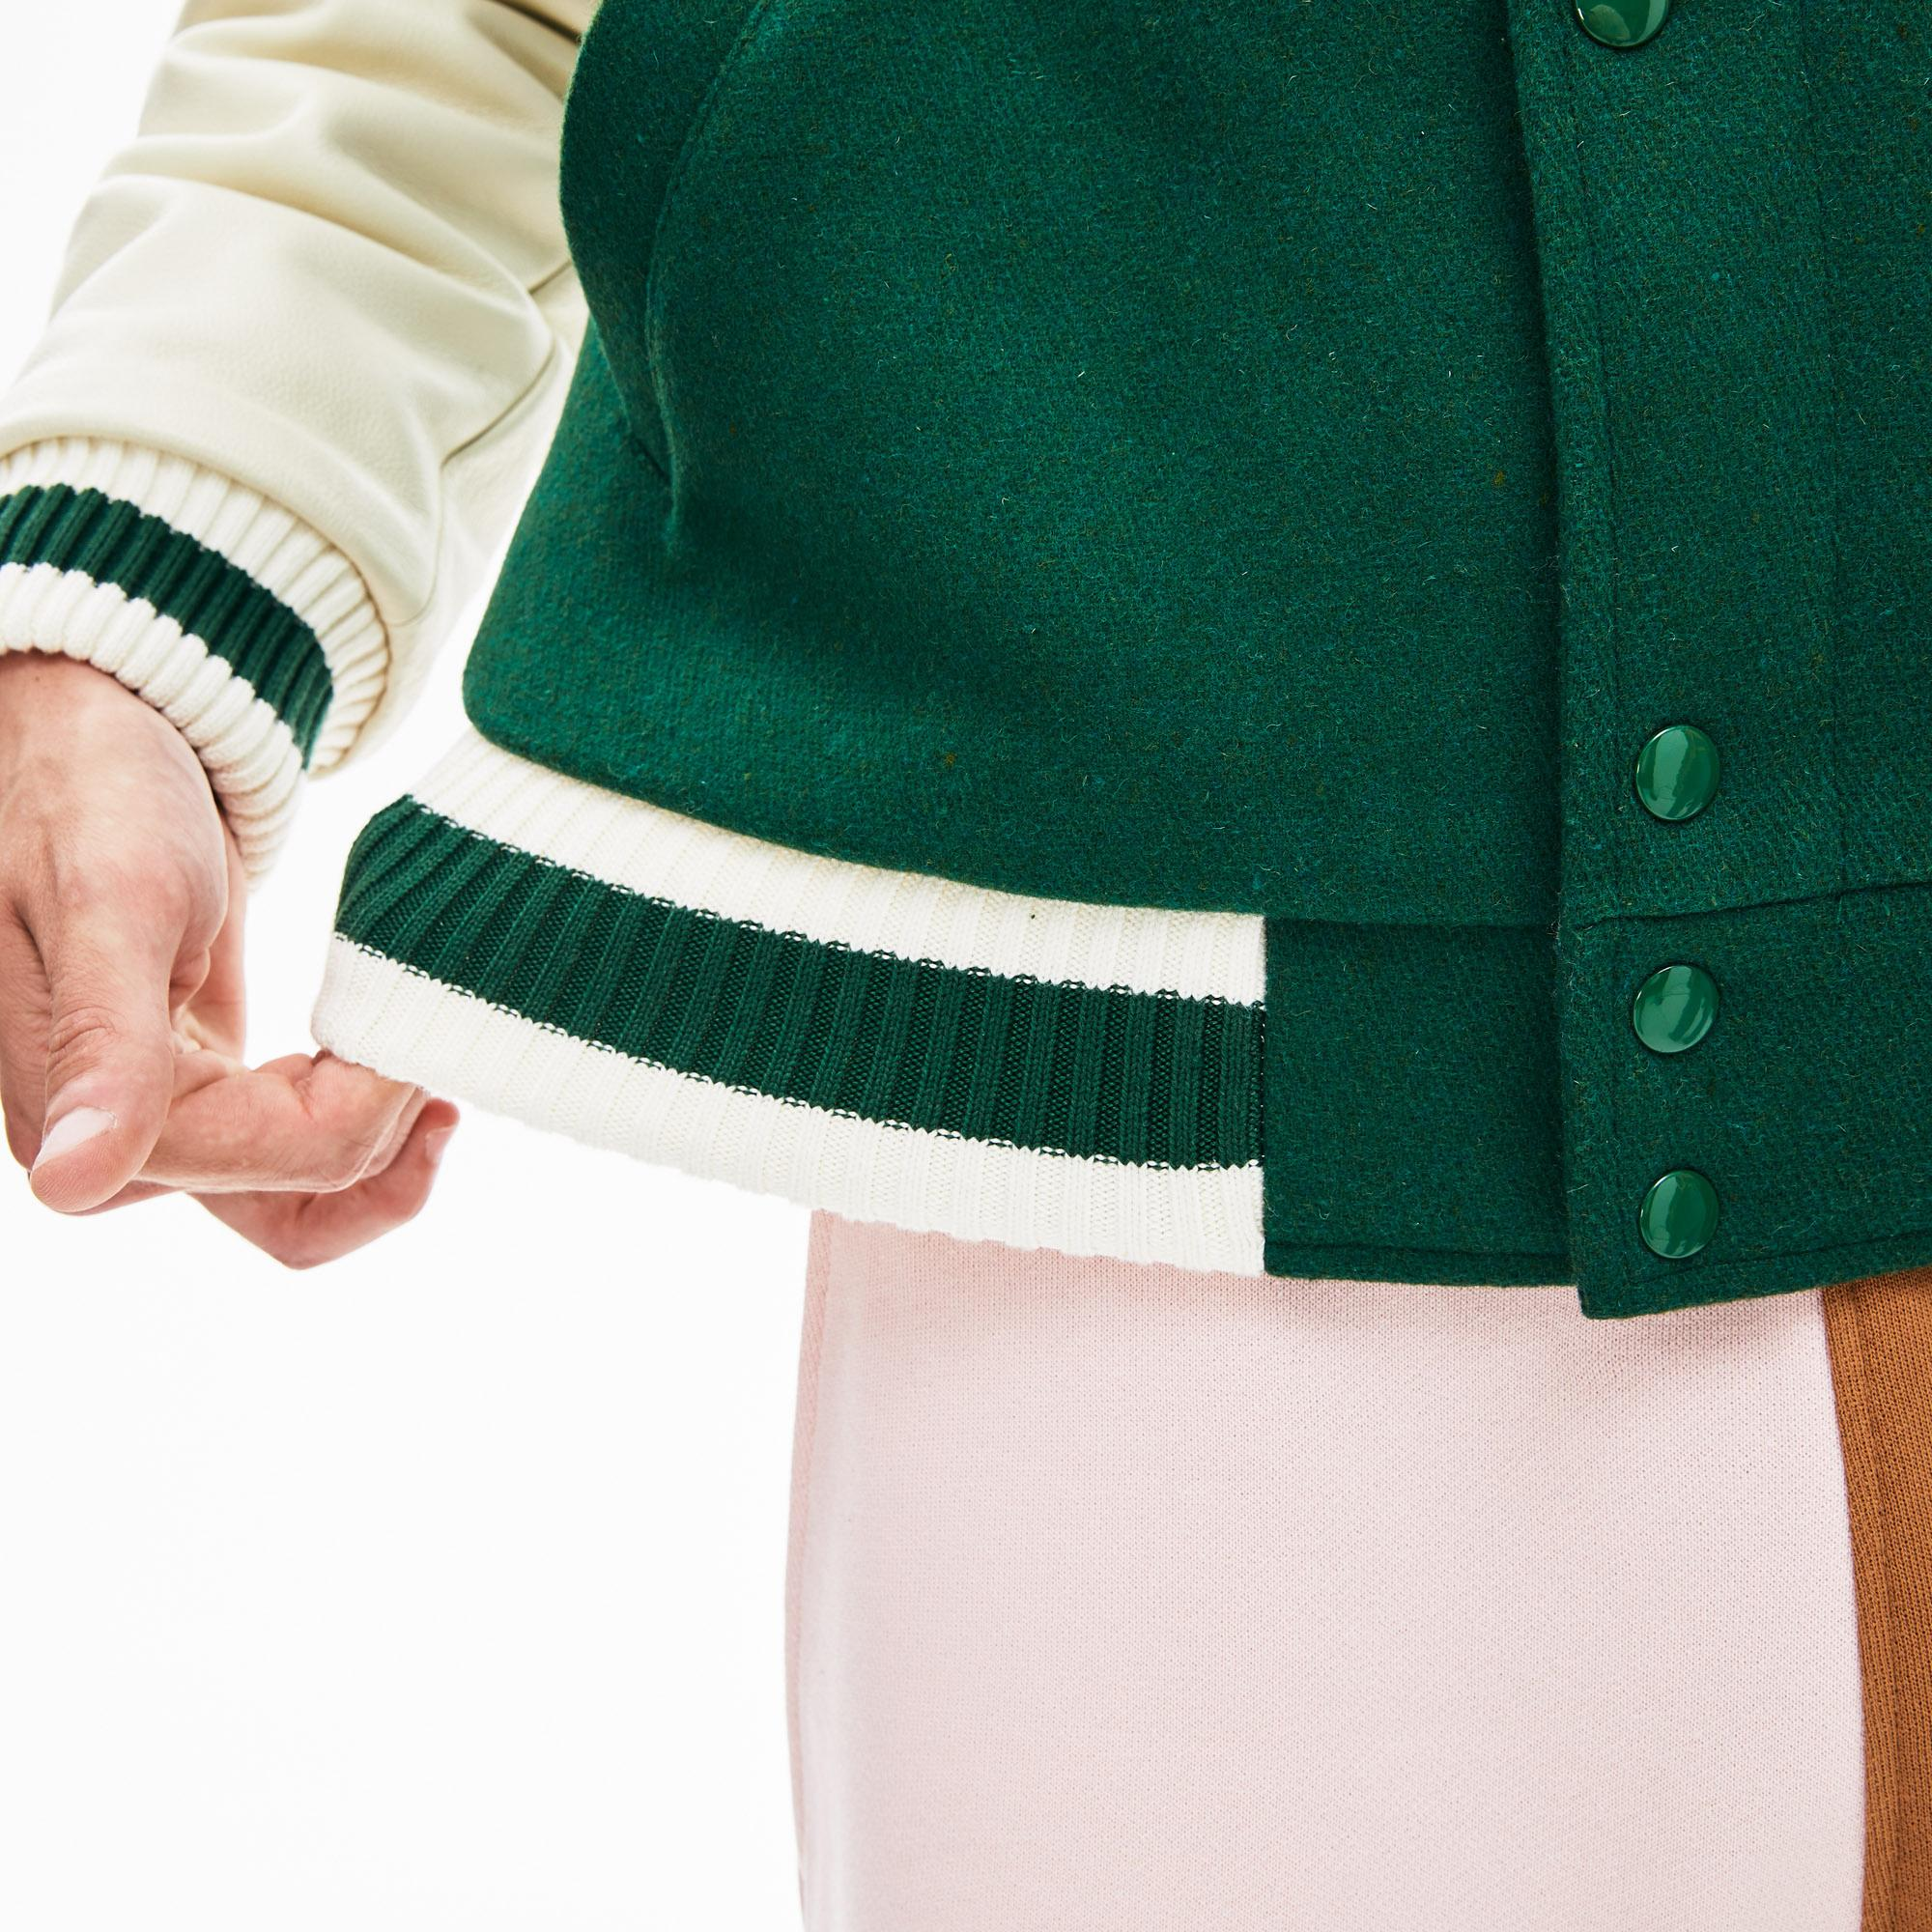 Lacoste X GOLF le FLEUR Unisex Yeşil Blok Desenli Ceket